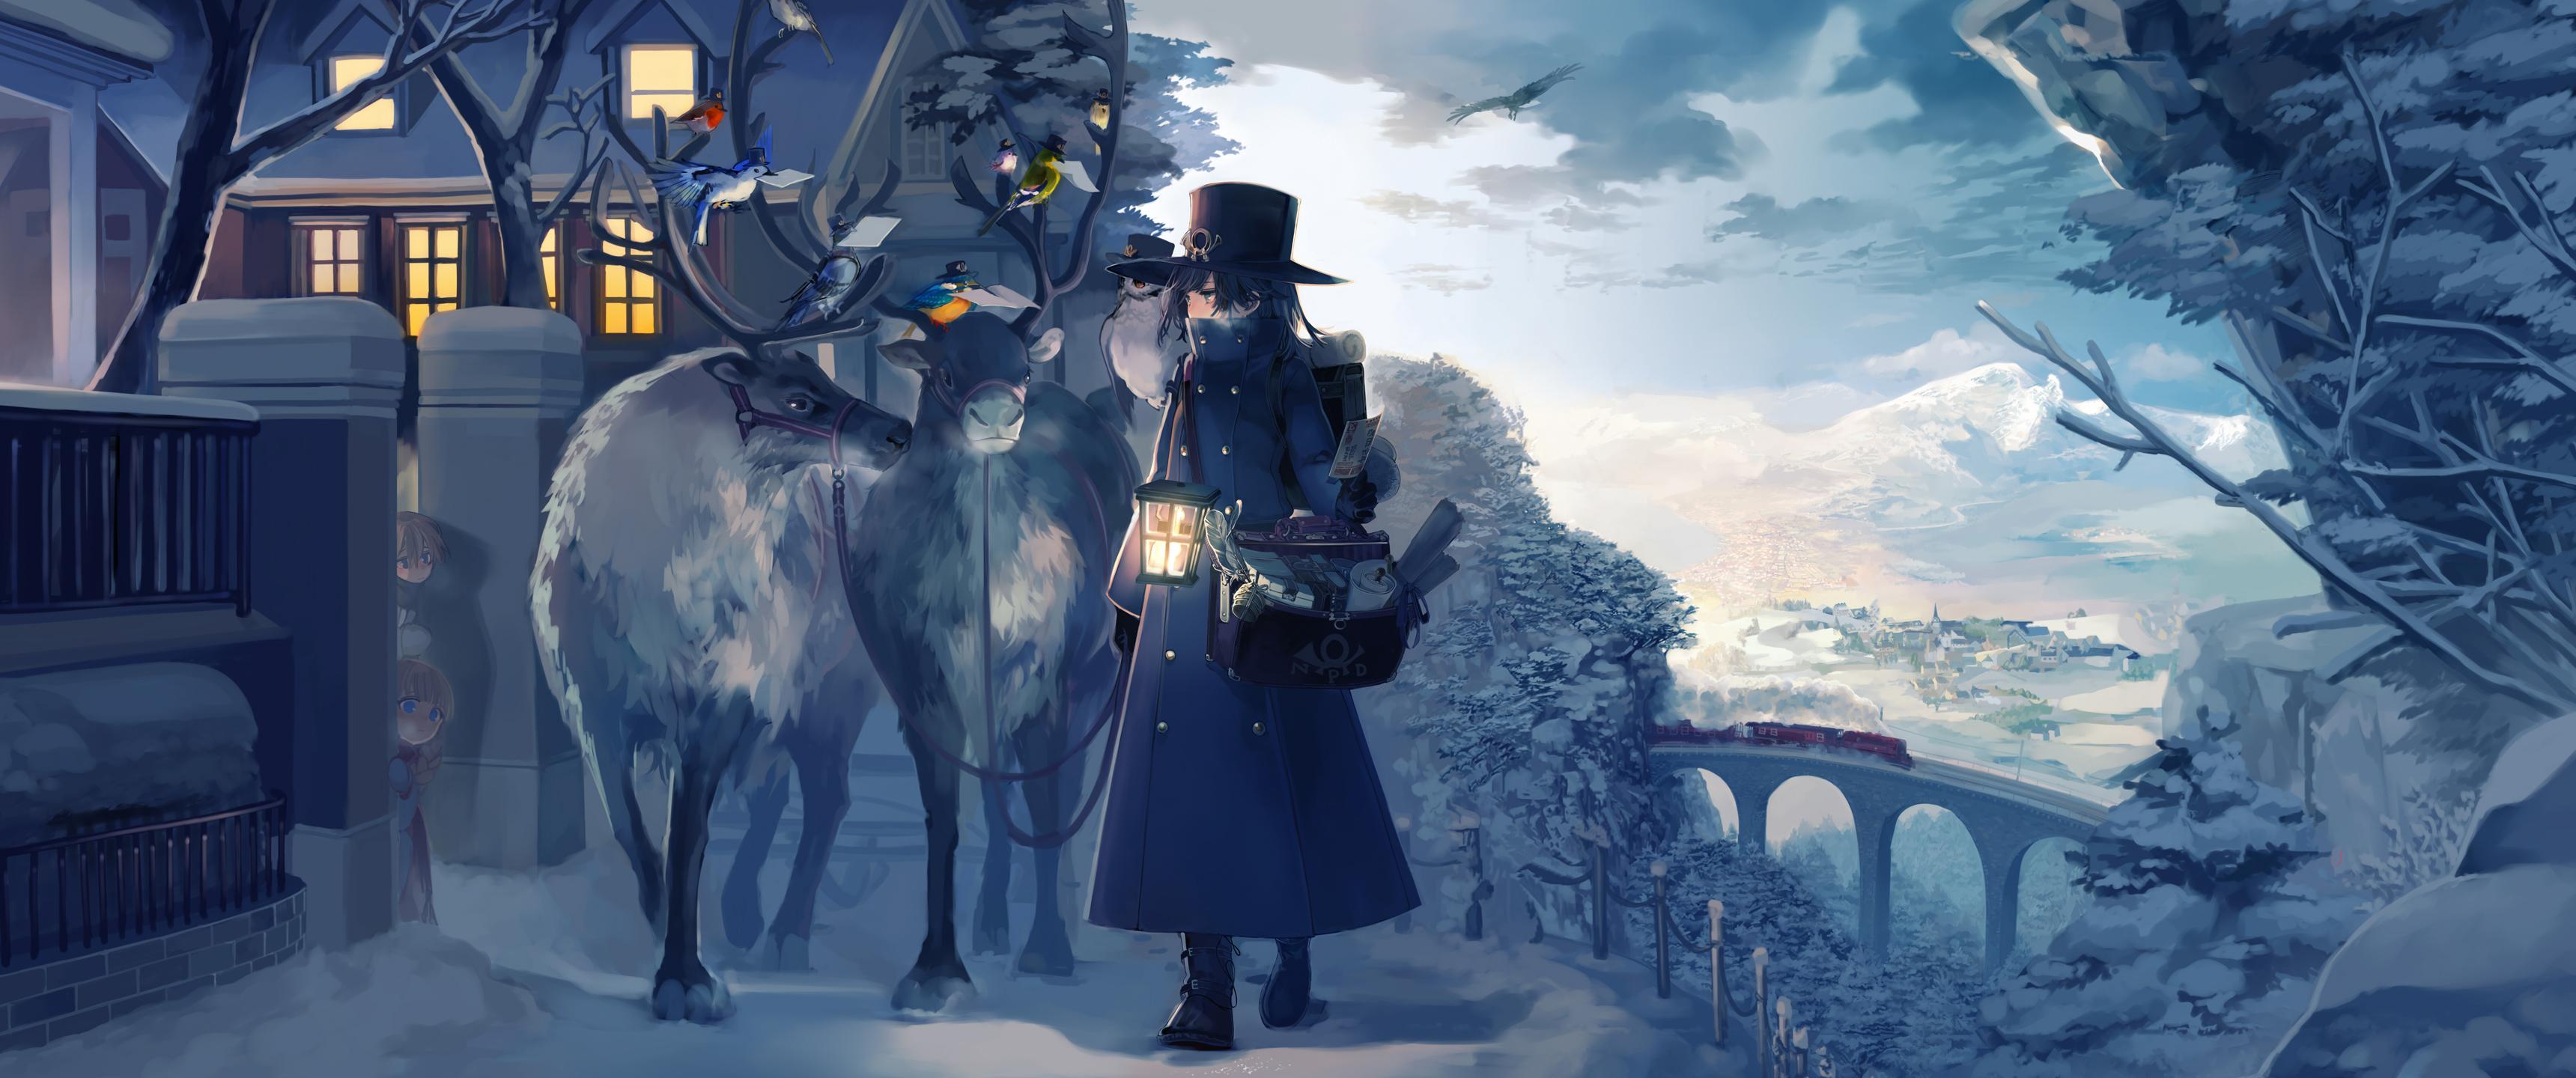 Wallpaper Anime Cold 3440x1440 Lurenjiamax 1244639 Hd